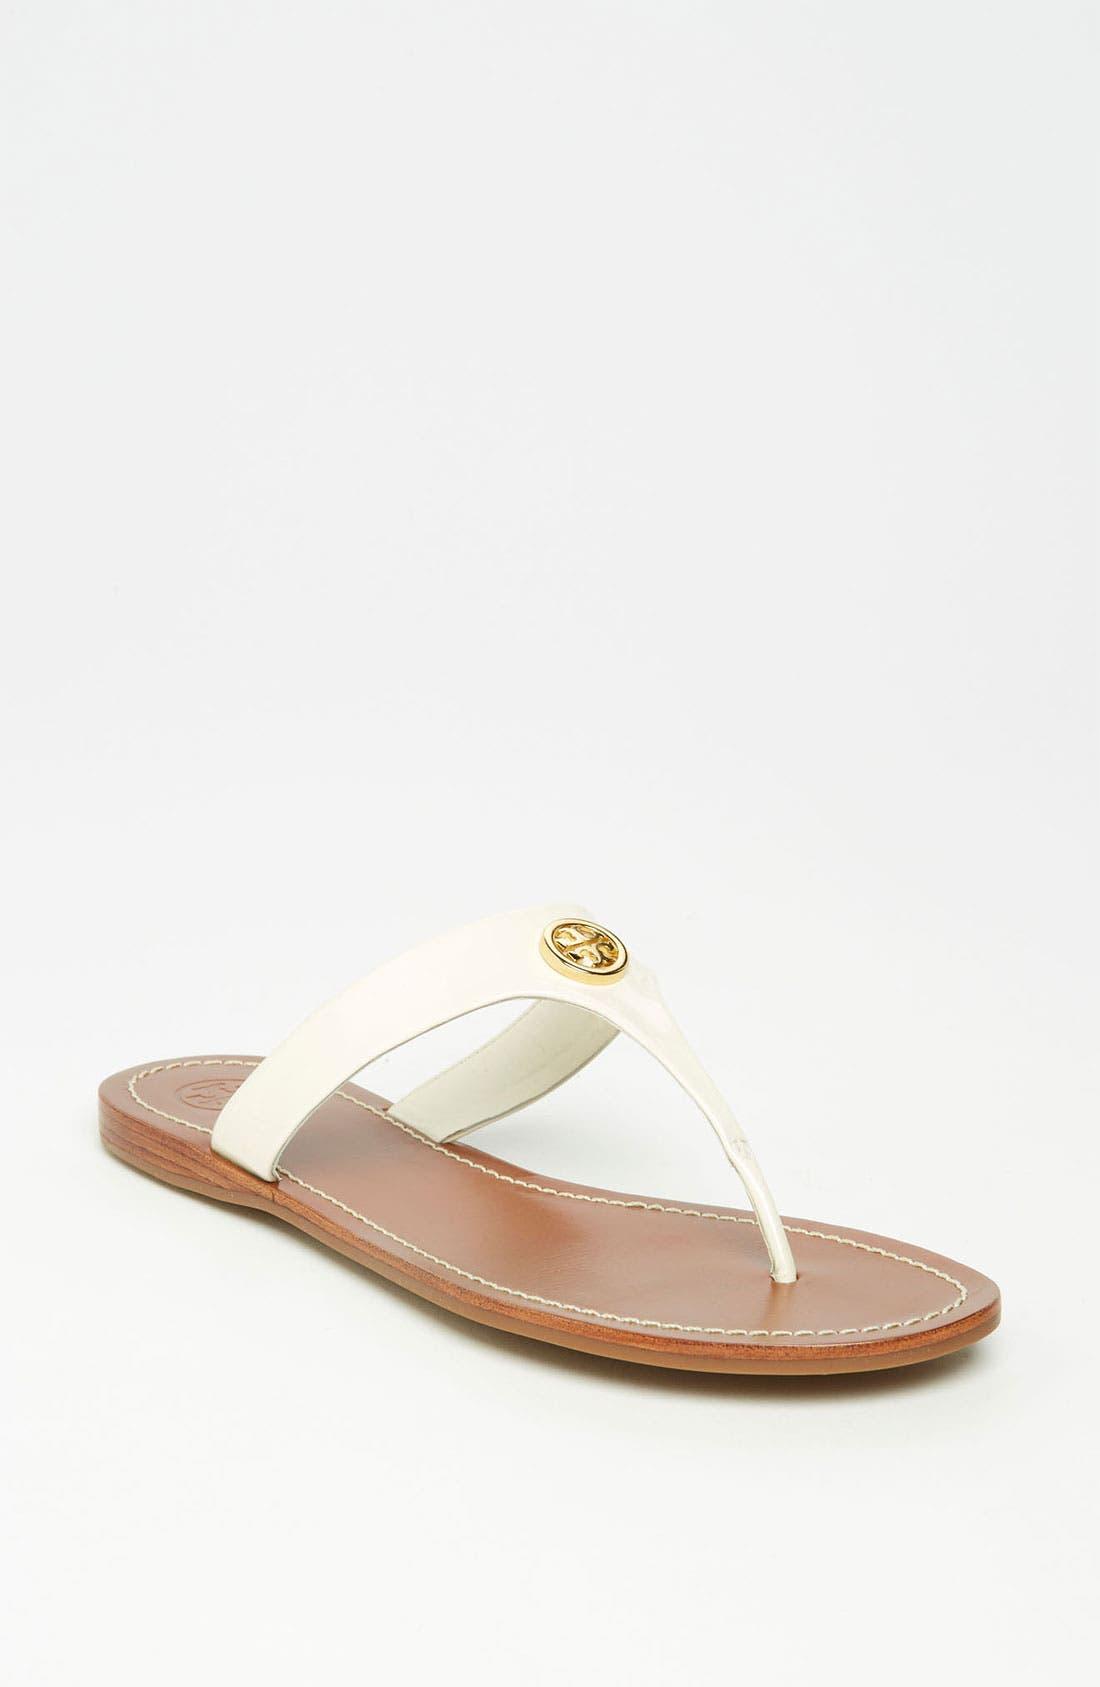 Main Image - Tory Burch 'Cameron' Sandal